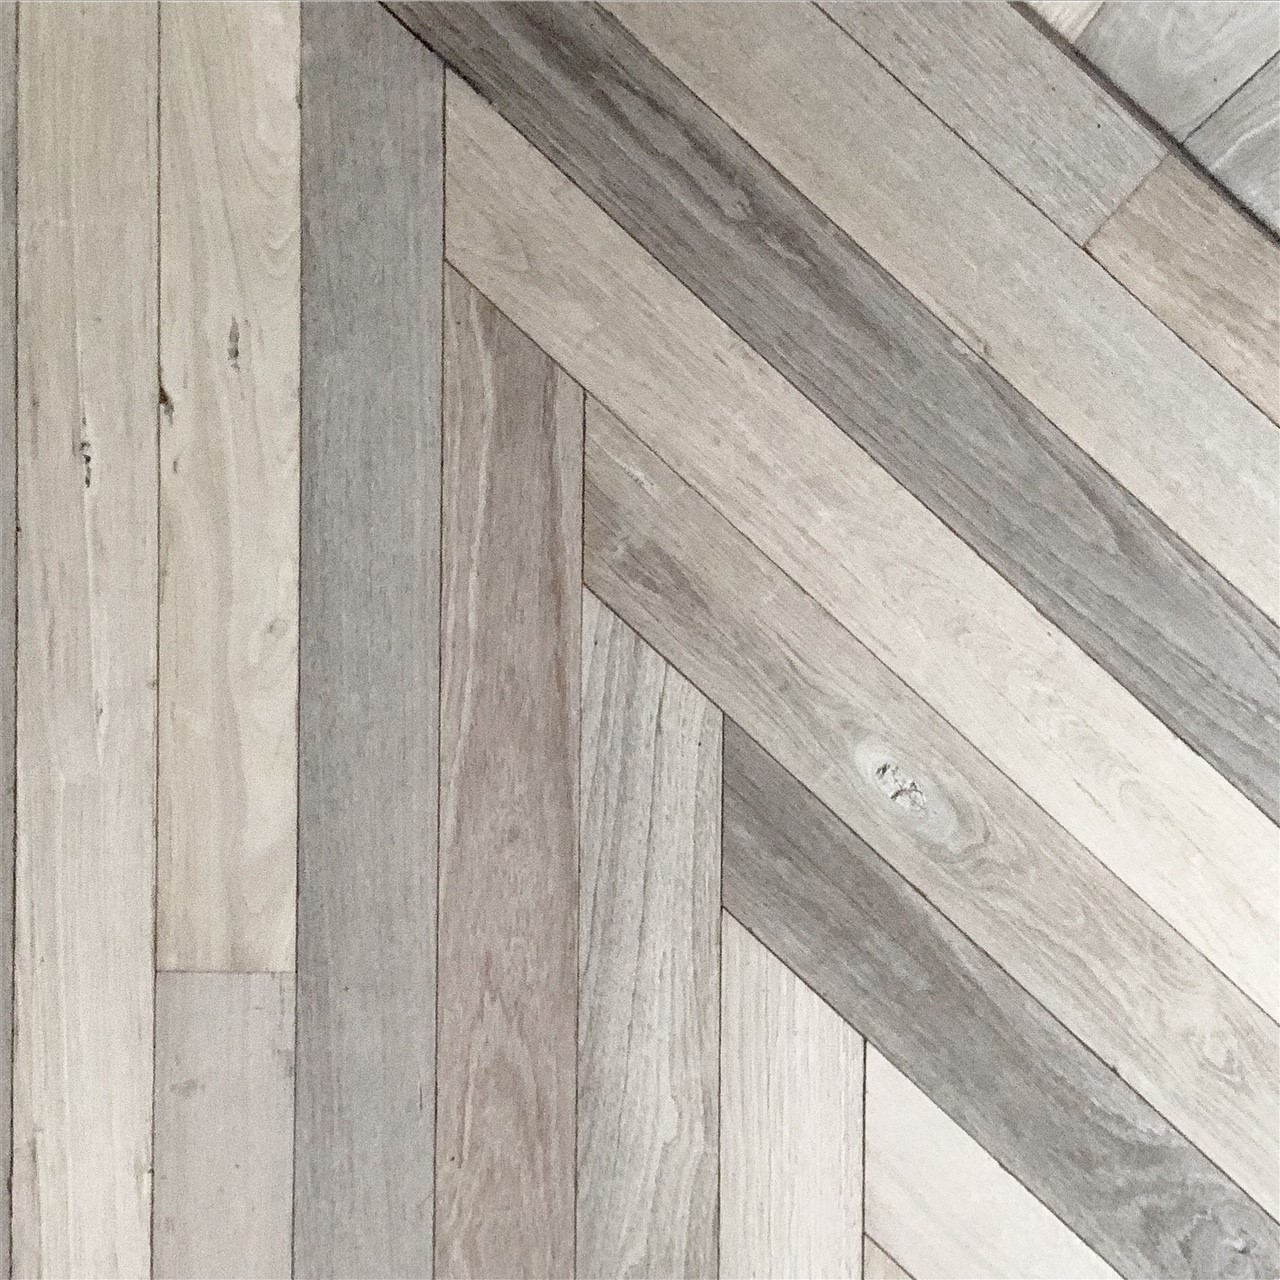 Timber Ceiling.jpg